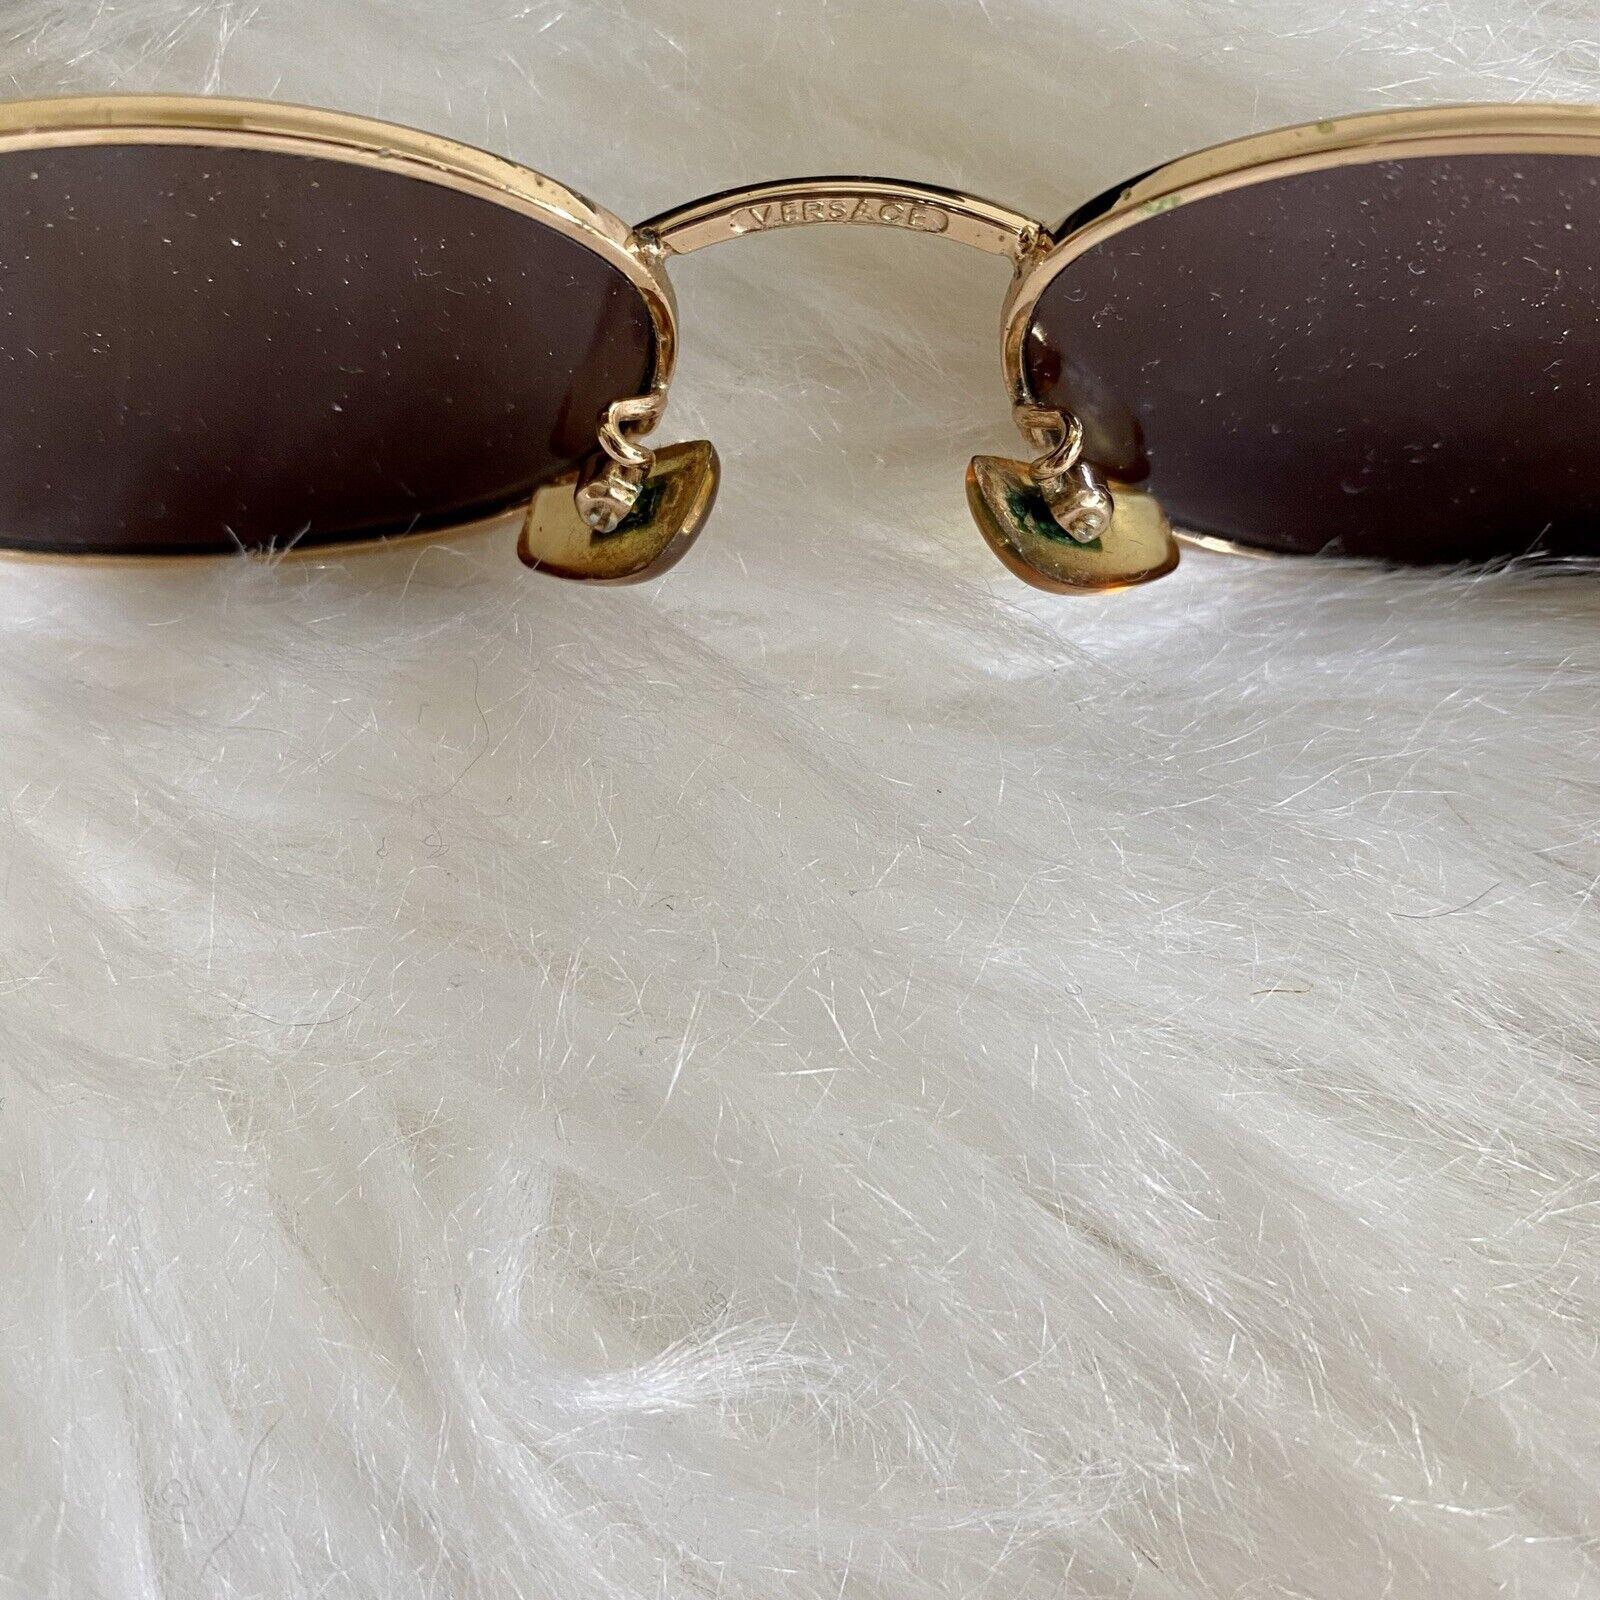 Vintage Gianni Versace Mod H35 COL 030 sunglasses - image 5